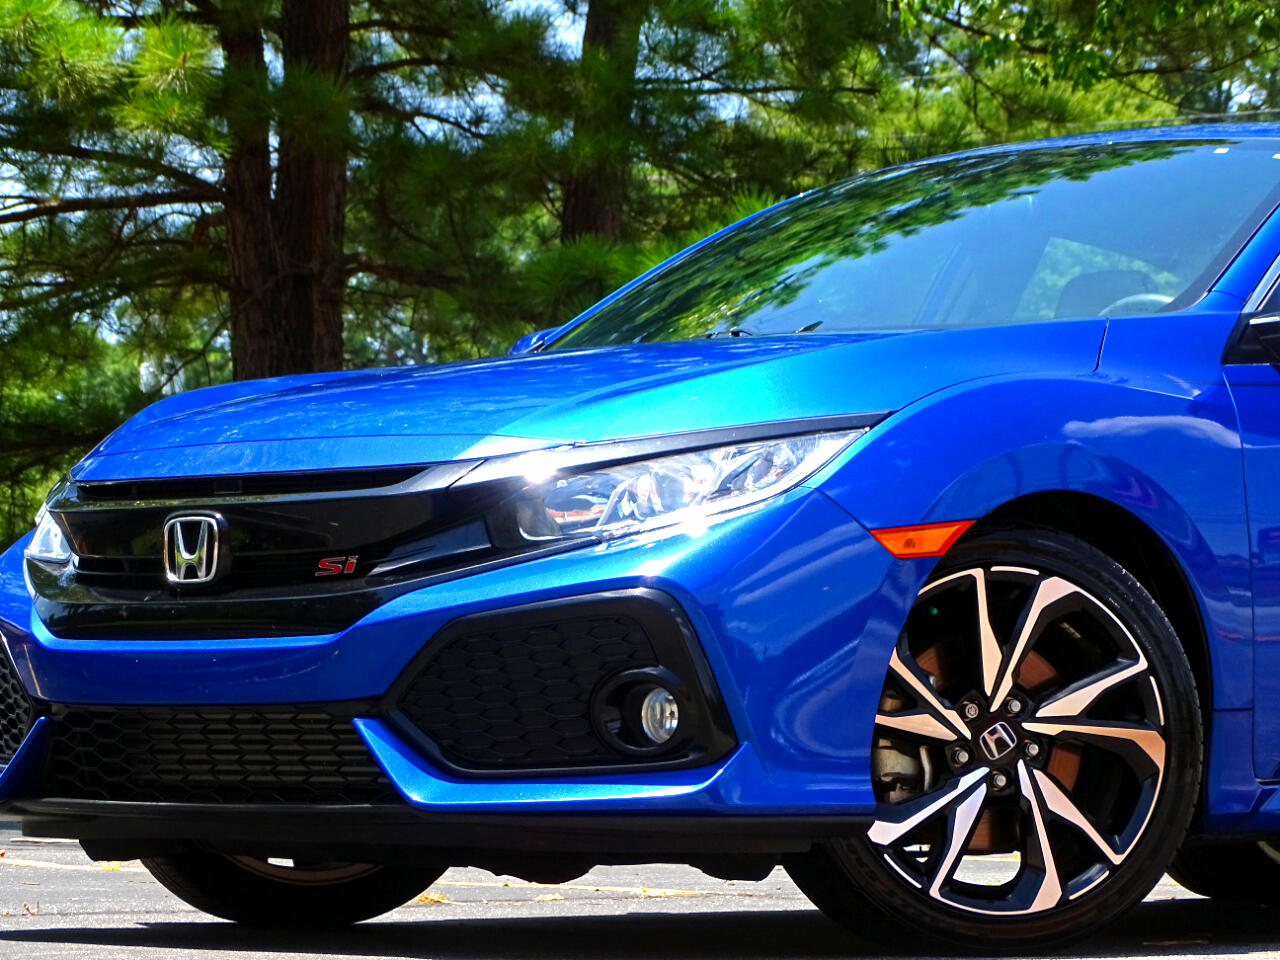 2018 Honda Civic Si Sedan Manual w/High Performance Tires